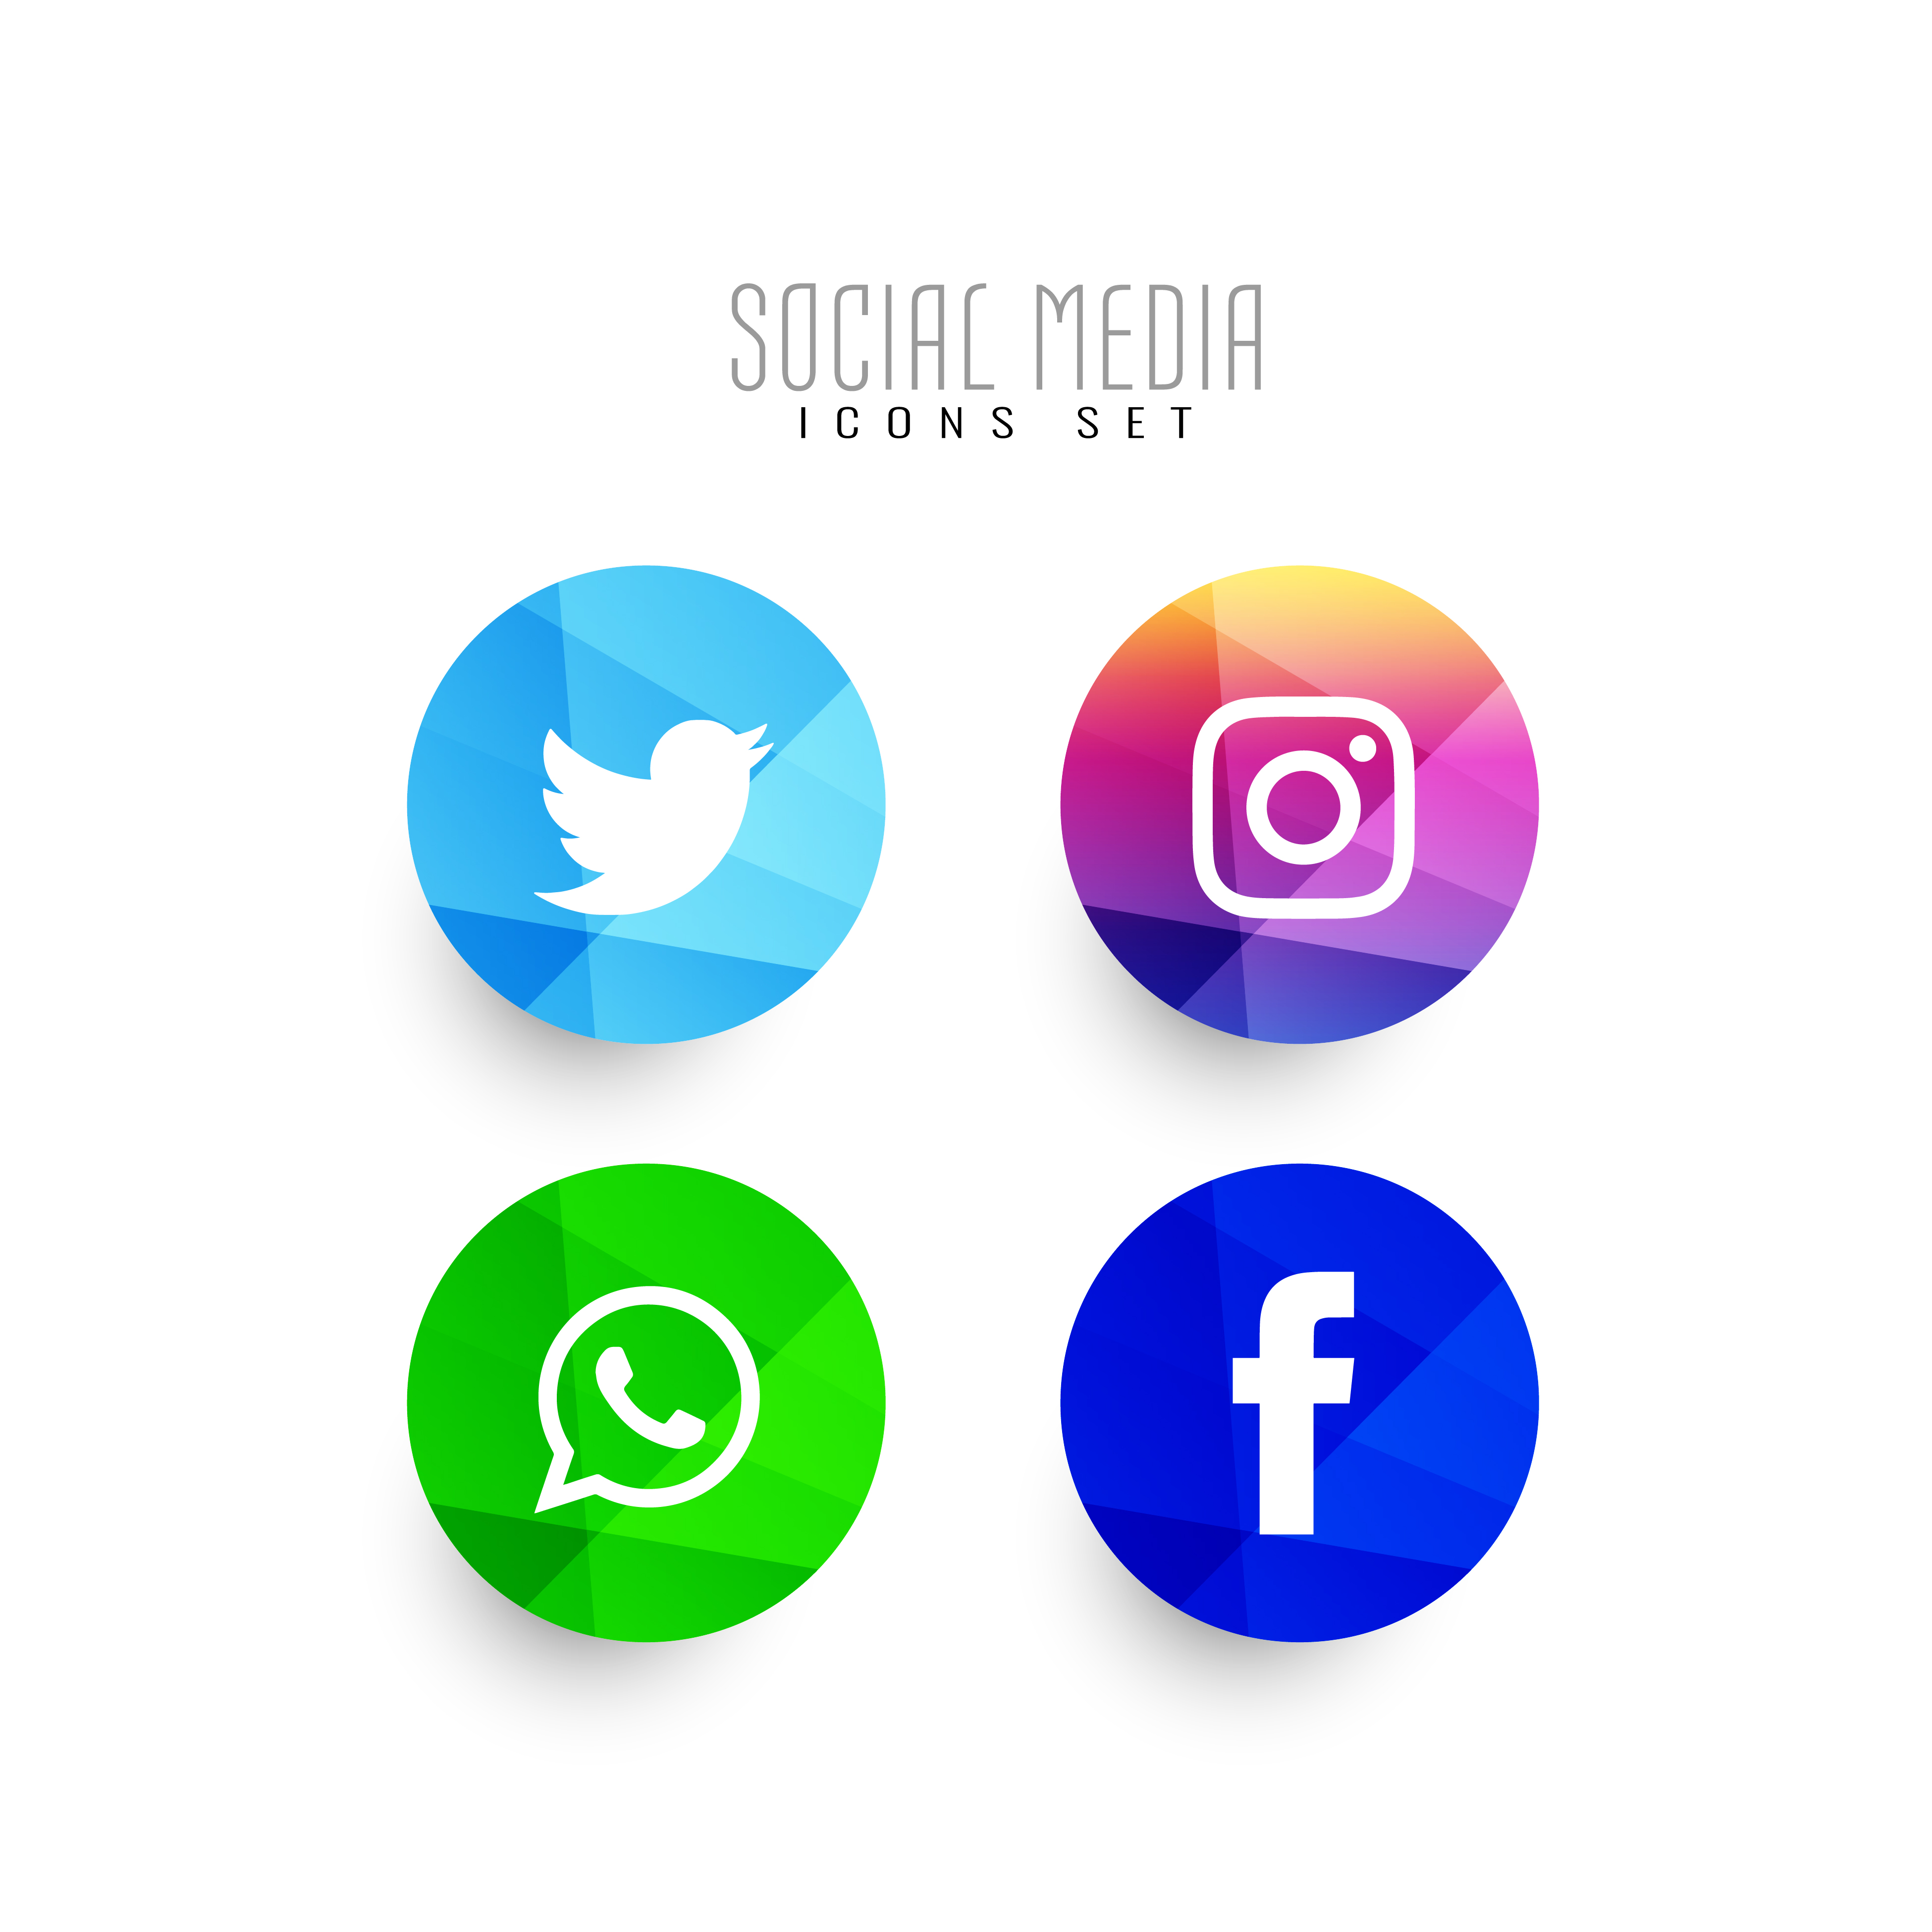 vector-abstract-modern-social-media-icons-set.jpg